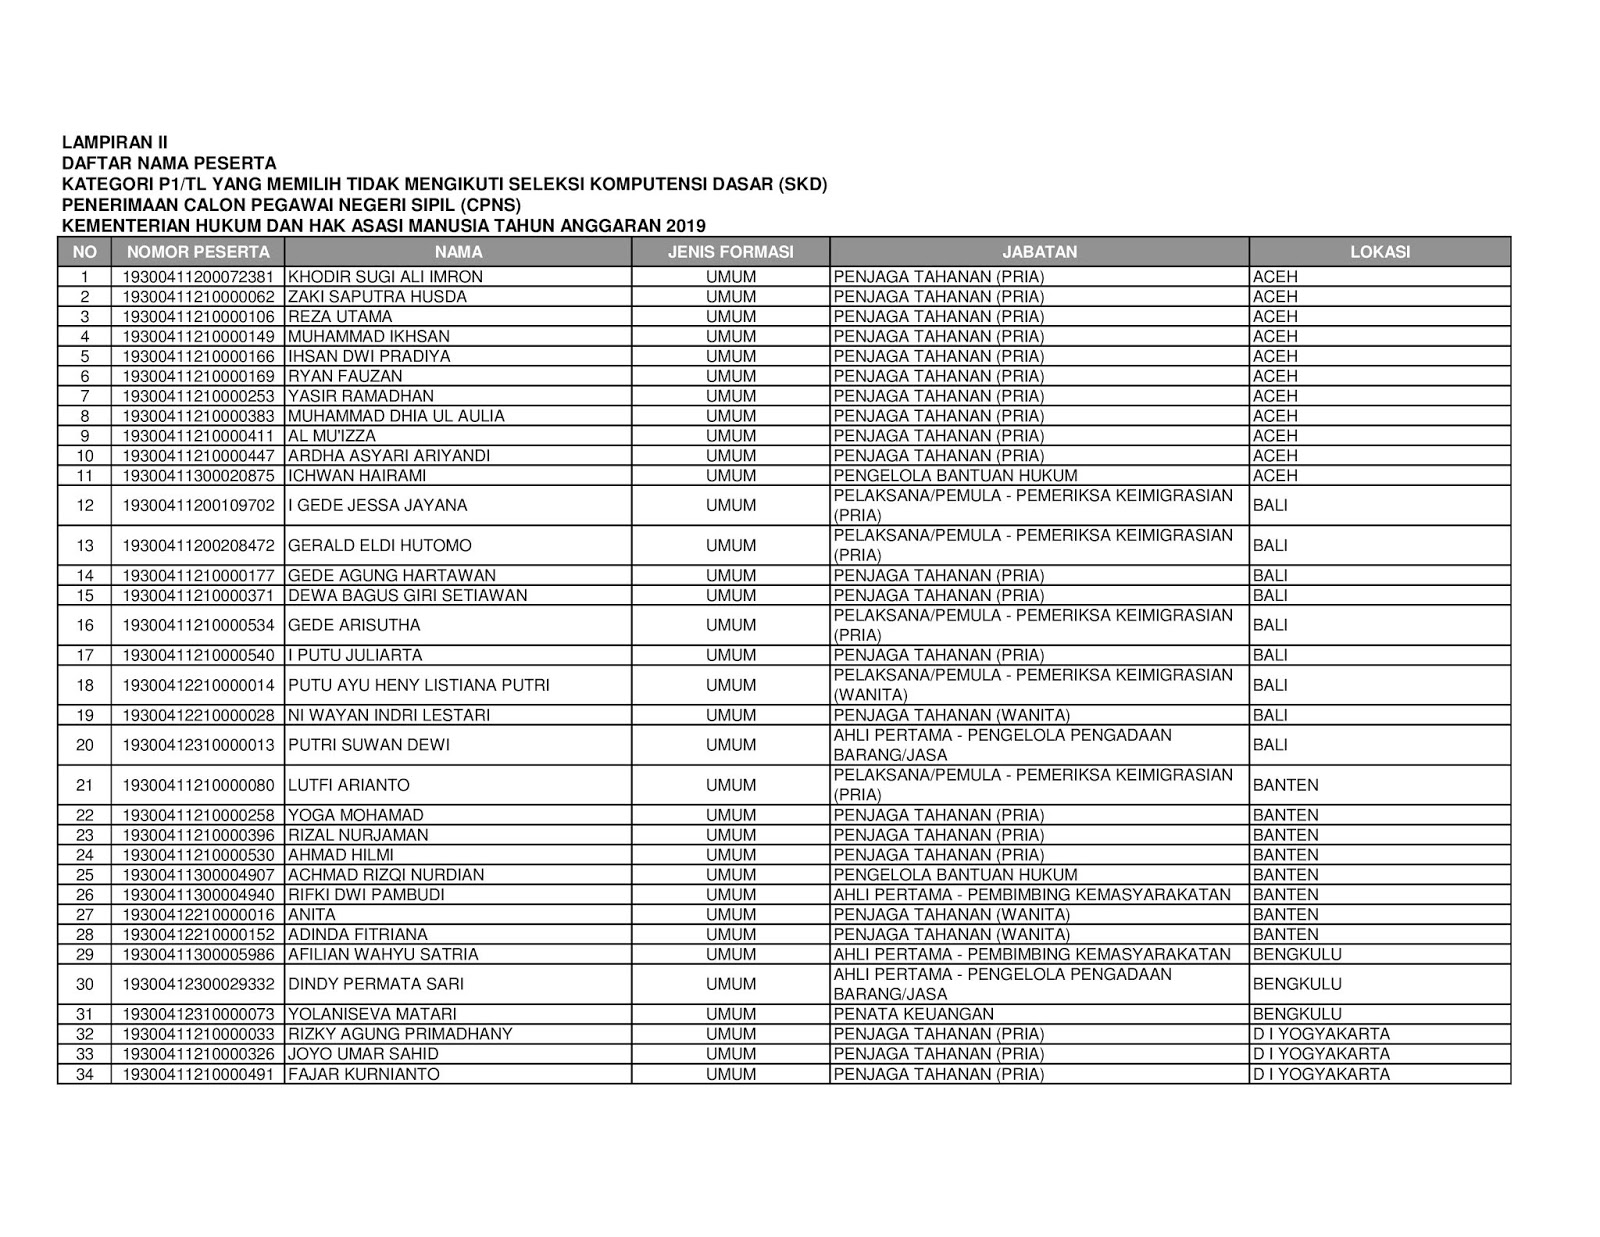 Inilah Daftar Nama Peserta Kategori P1/TL Yang Memilih Tidak Ikut Ujian SKD CPNS Kemenkumham